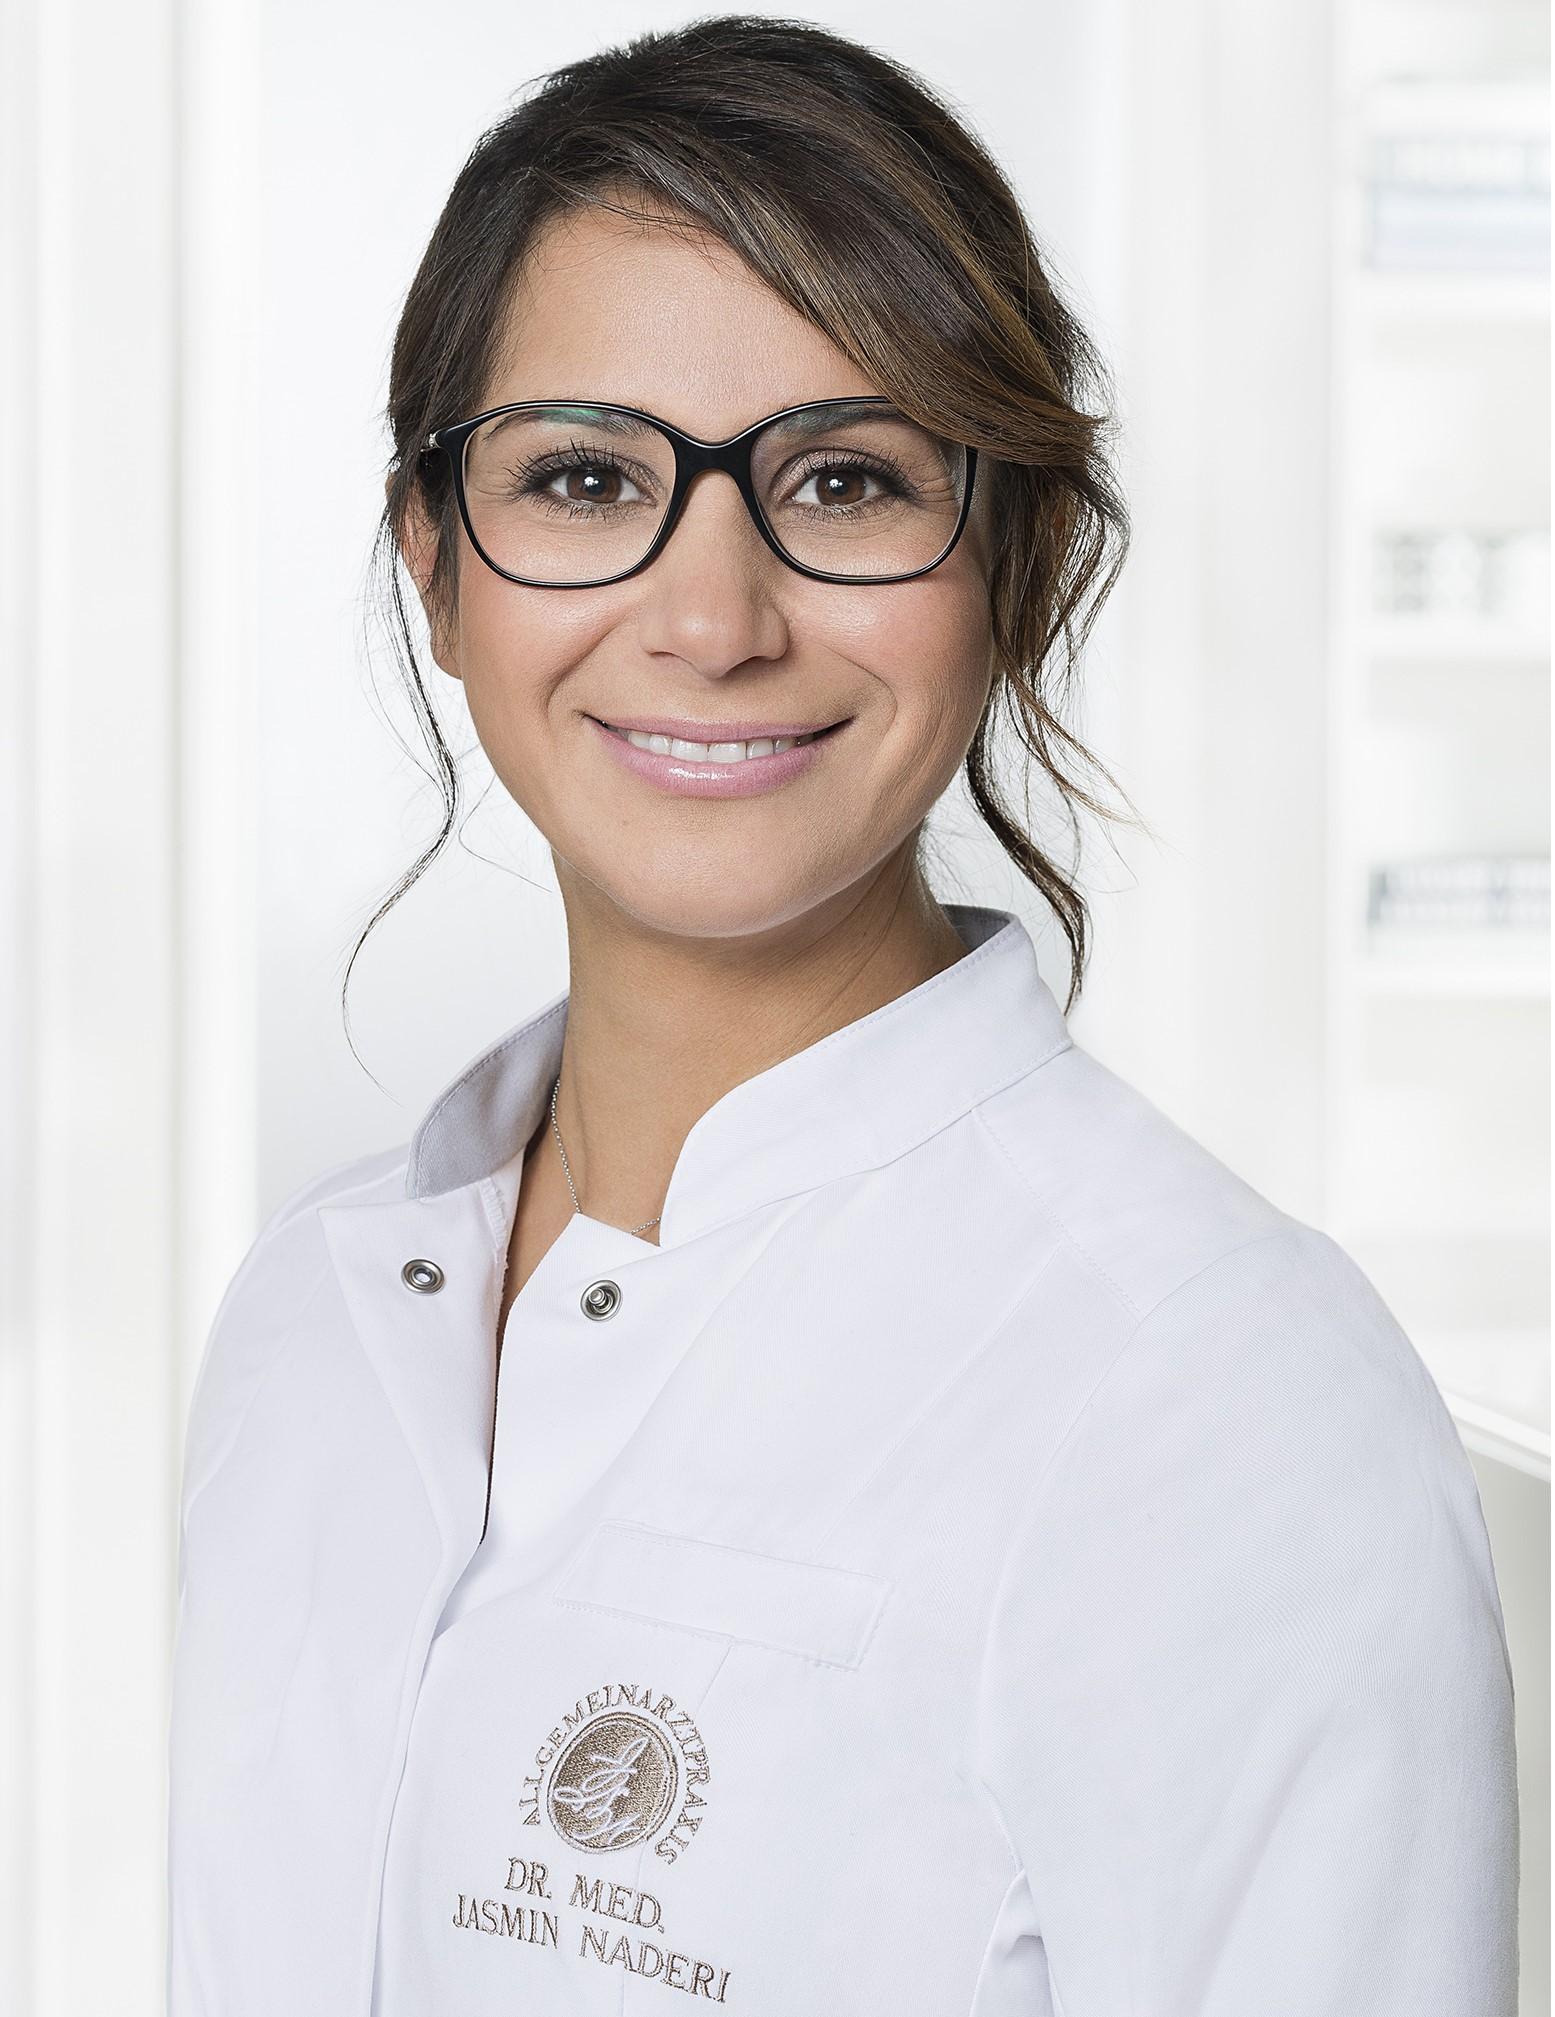 Dr. med. Jasmin Naderi-Wöhler | Praxis und Beratung Hausarztpraxis in den Hamburger Elbvororten